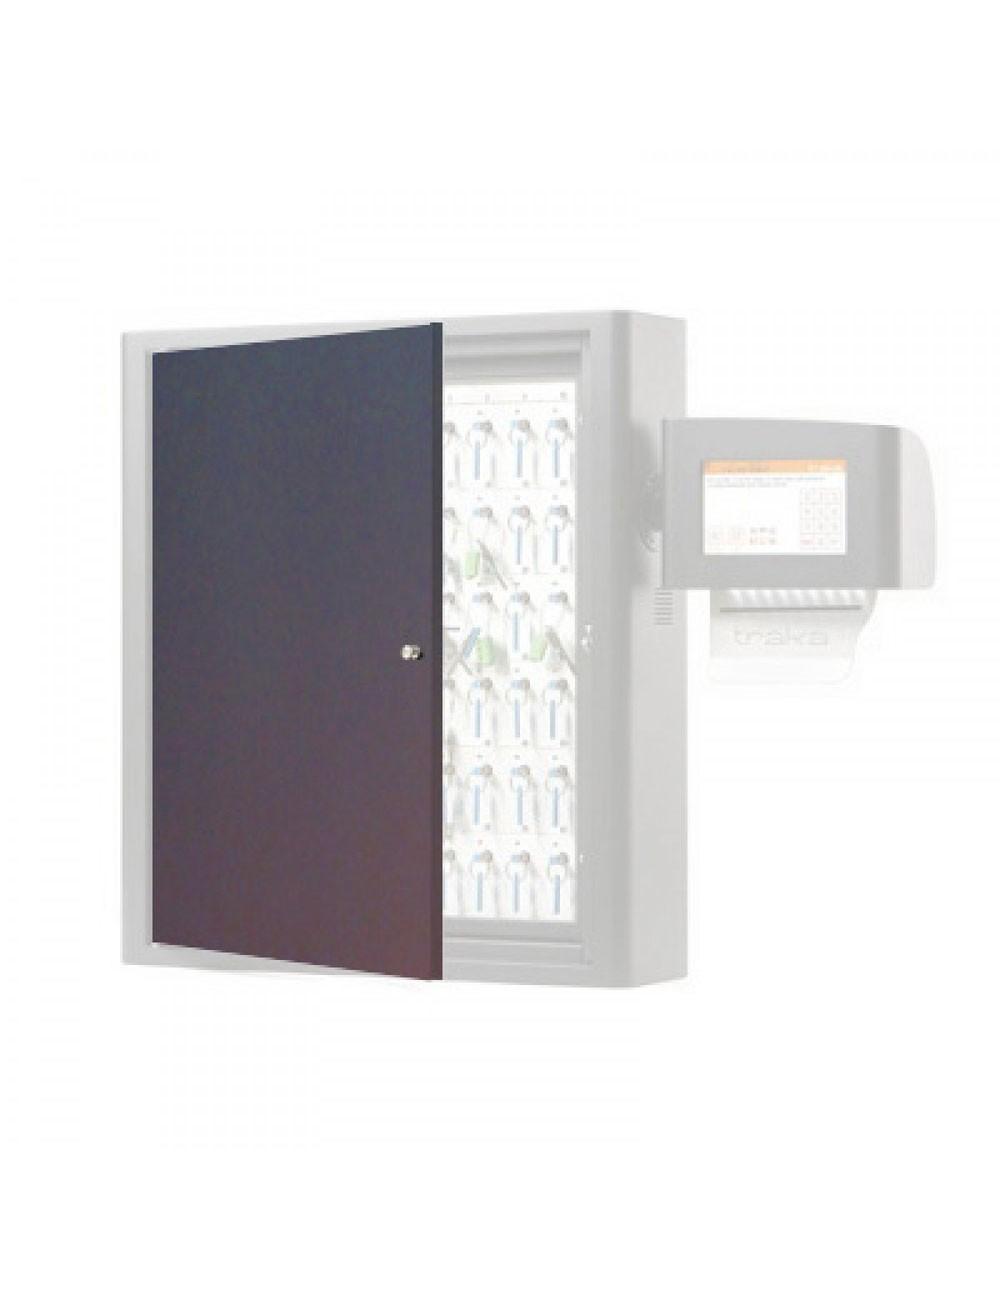 Porte métallique pleine pour Traka Touch standard